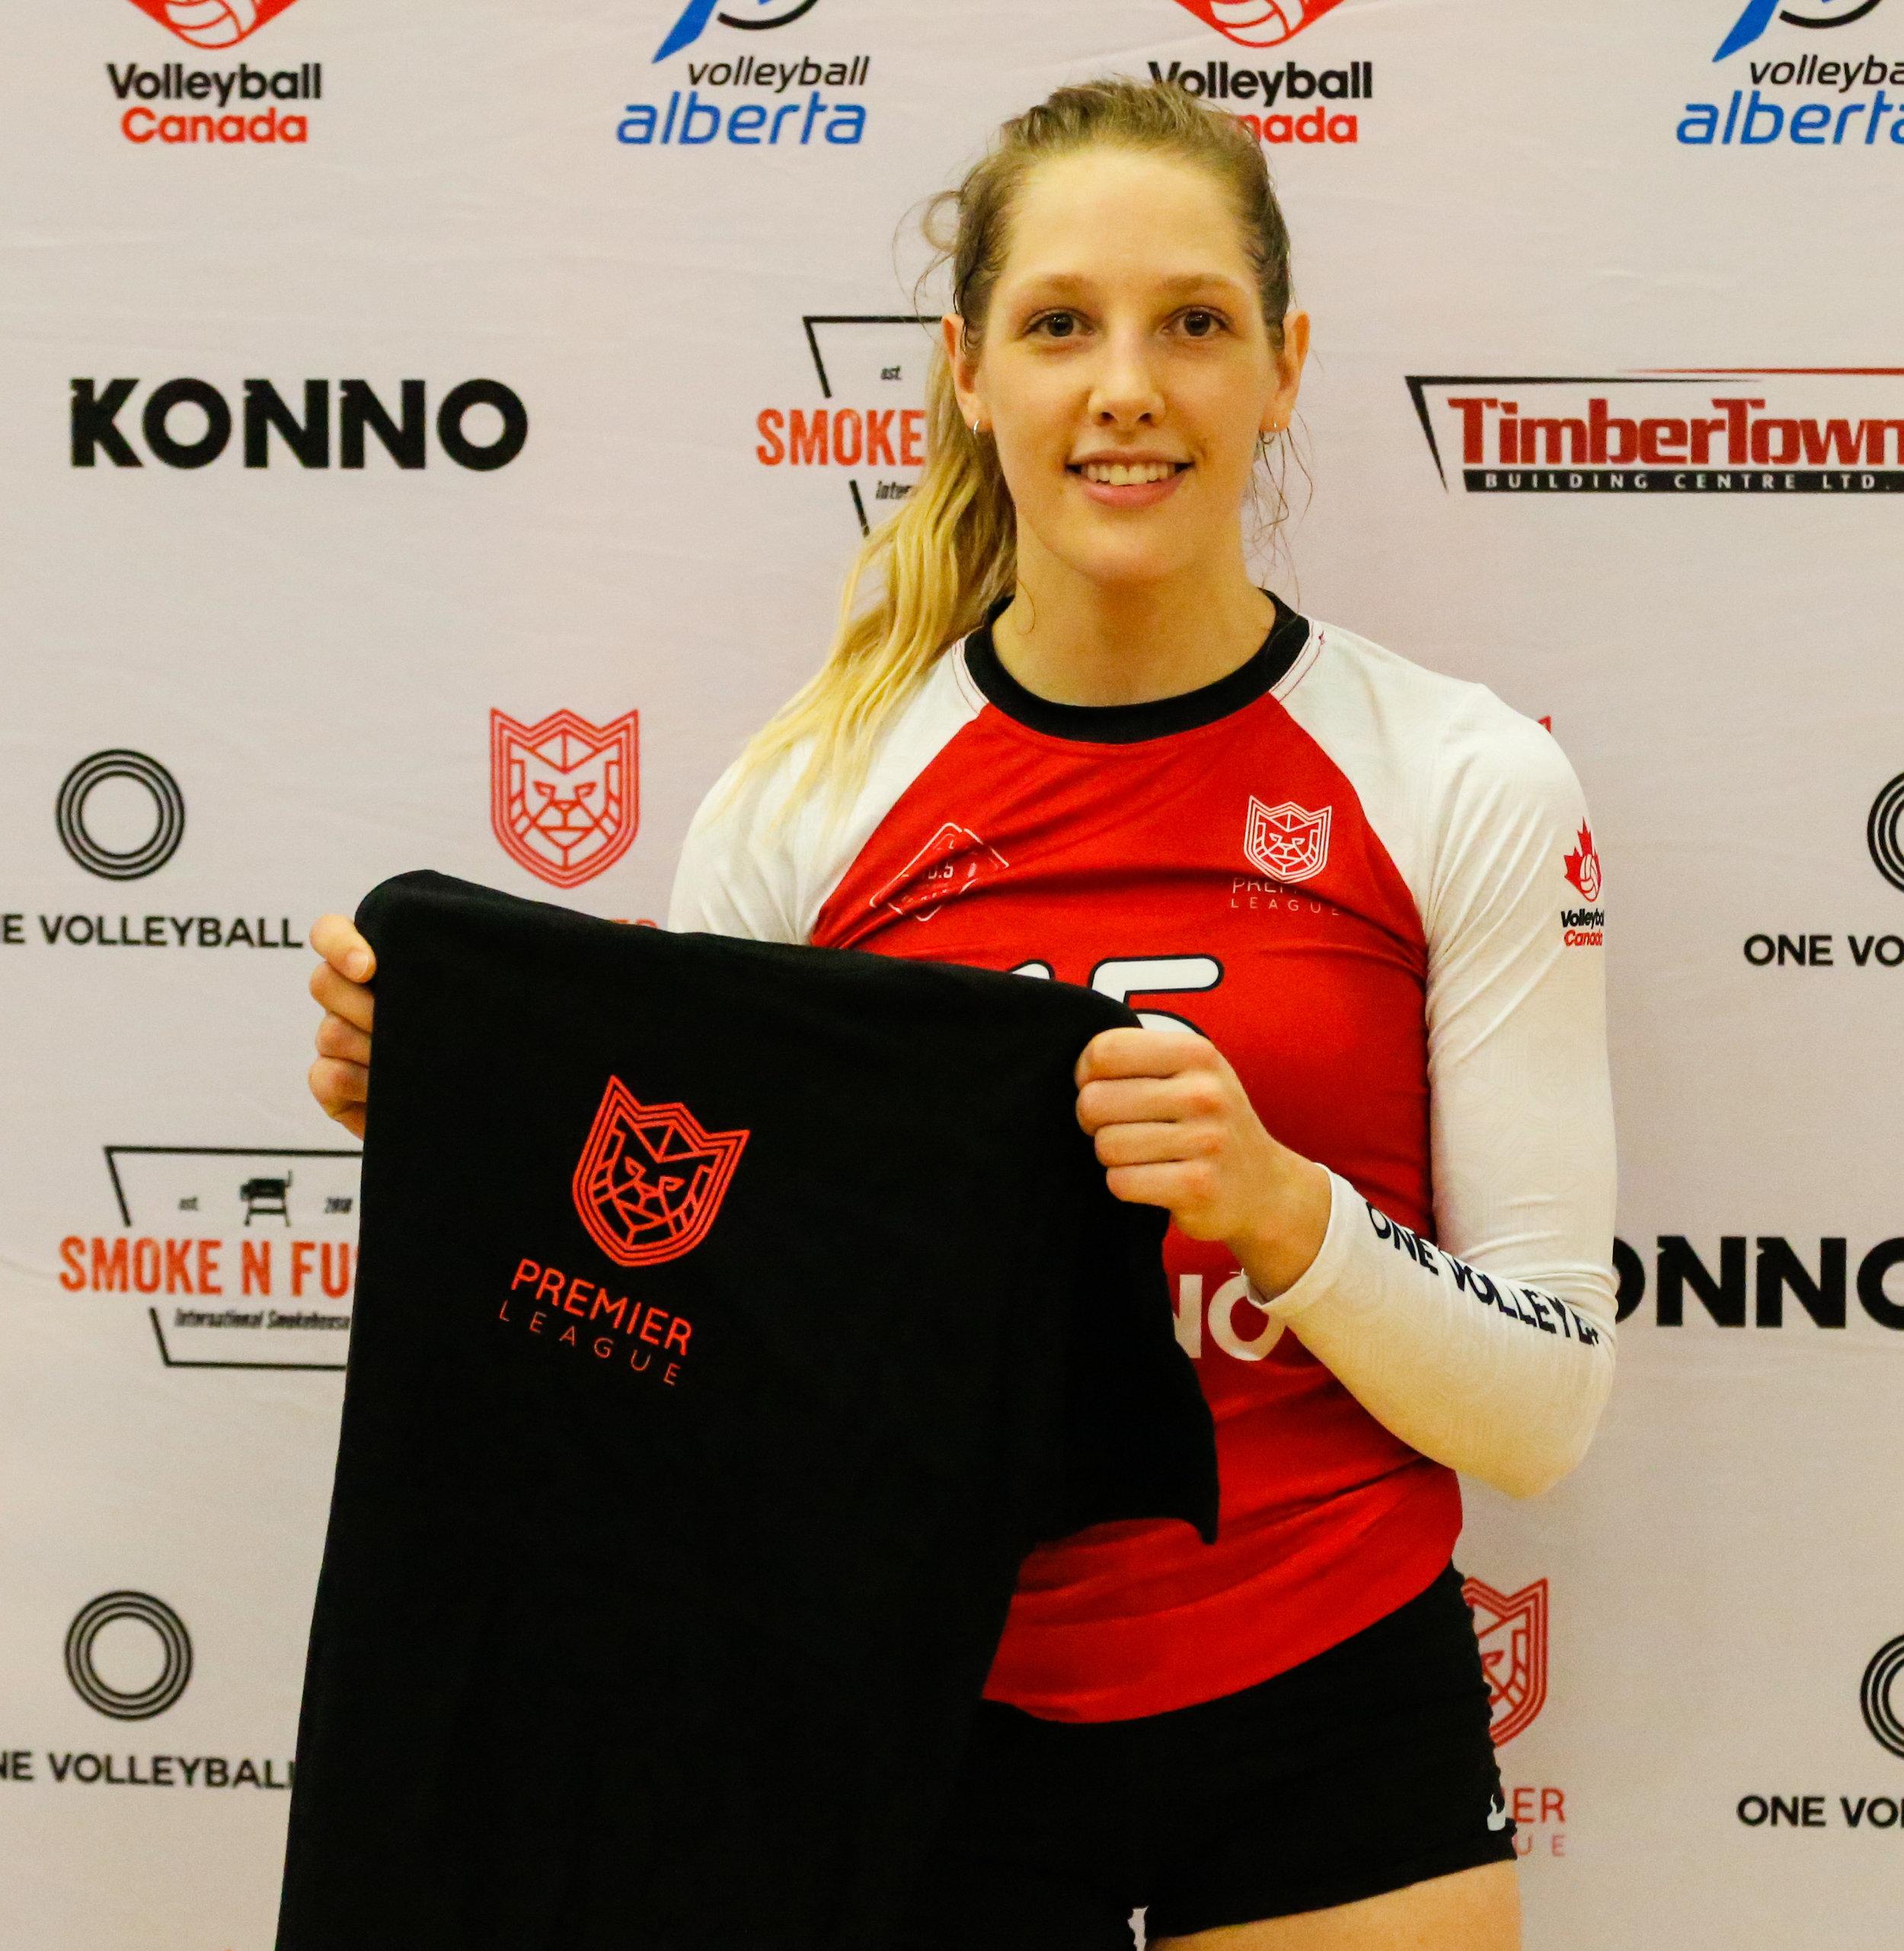 20190717 One Volleyball women's Finals DH 0743.jpg